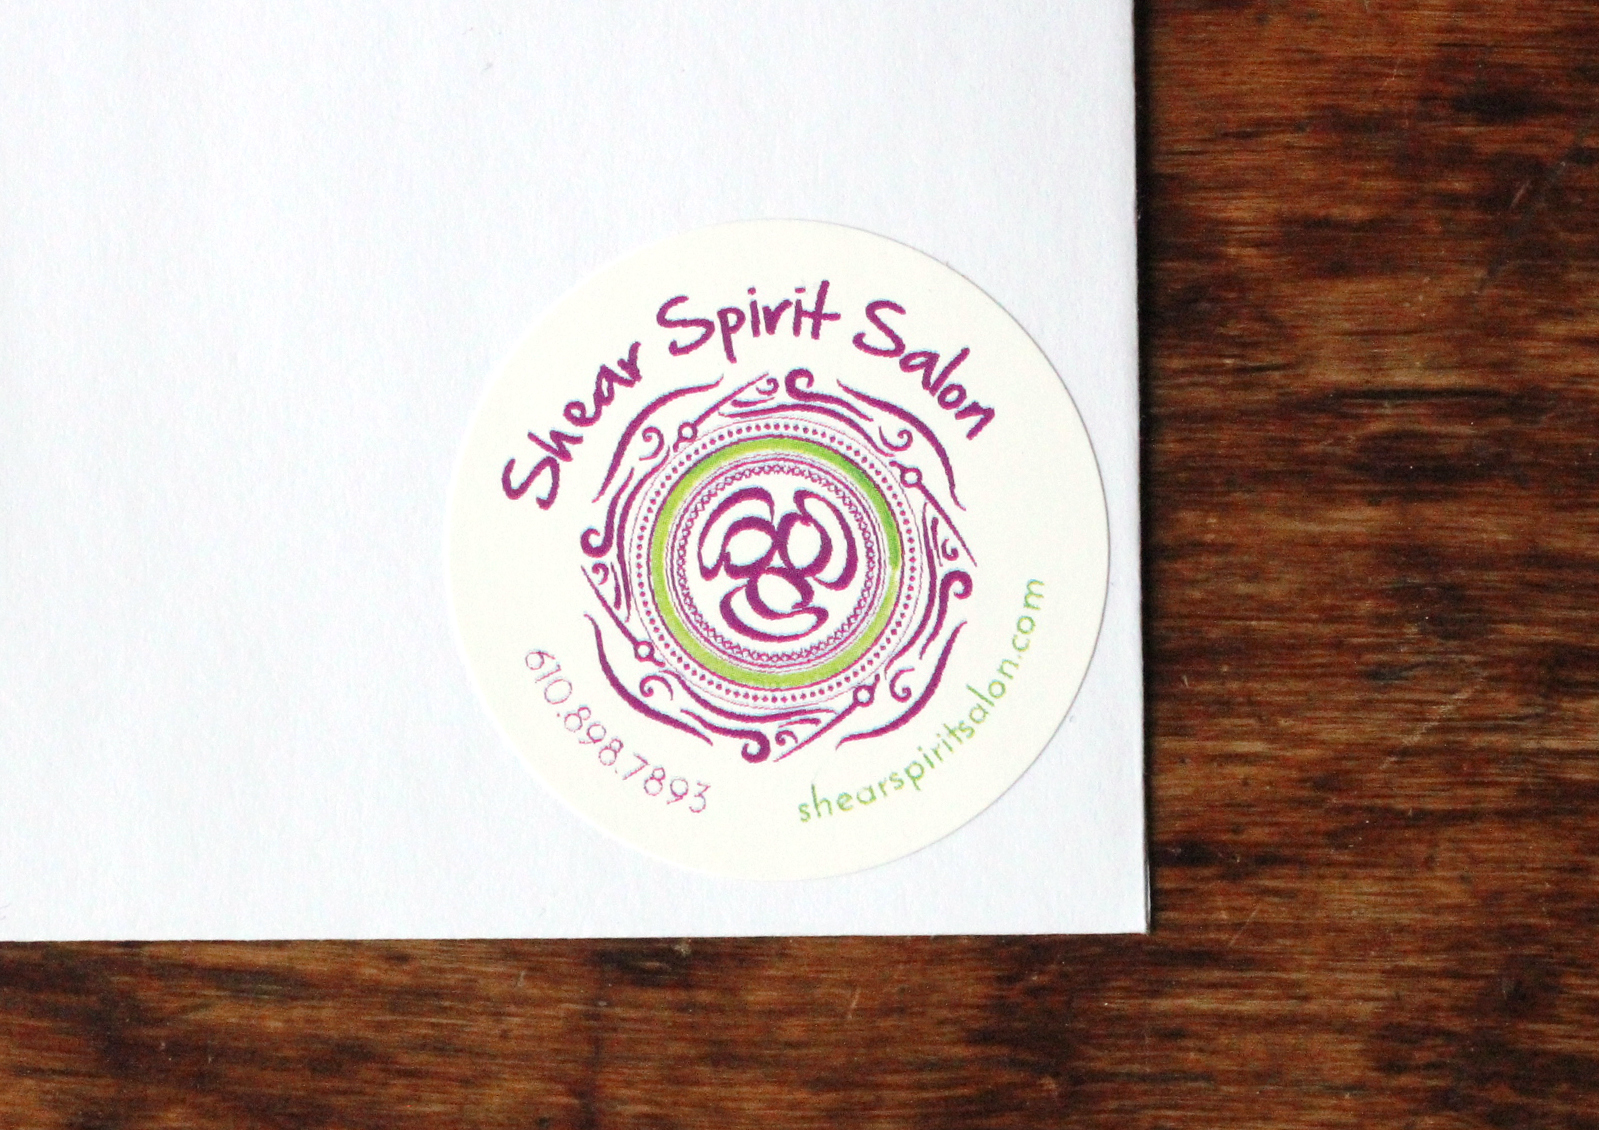 shear spirit salon | full logo & sticker